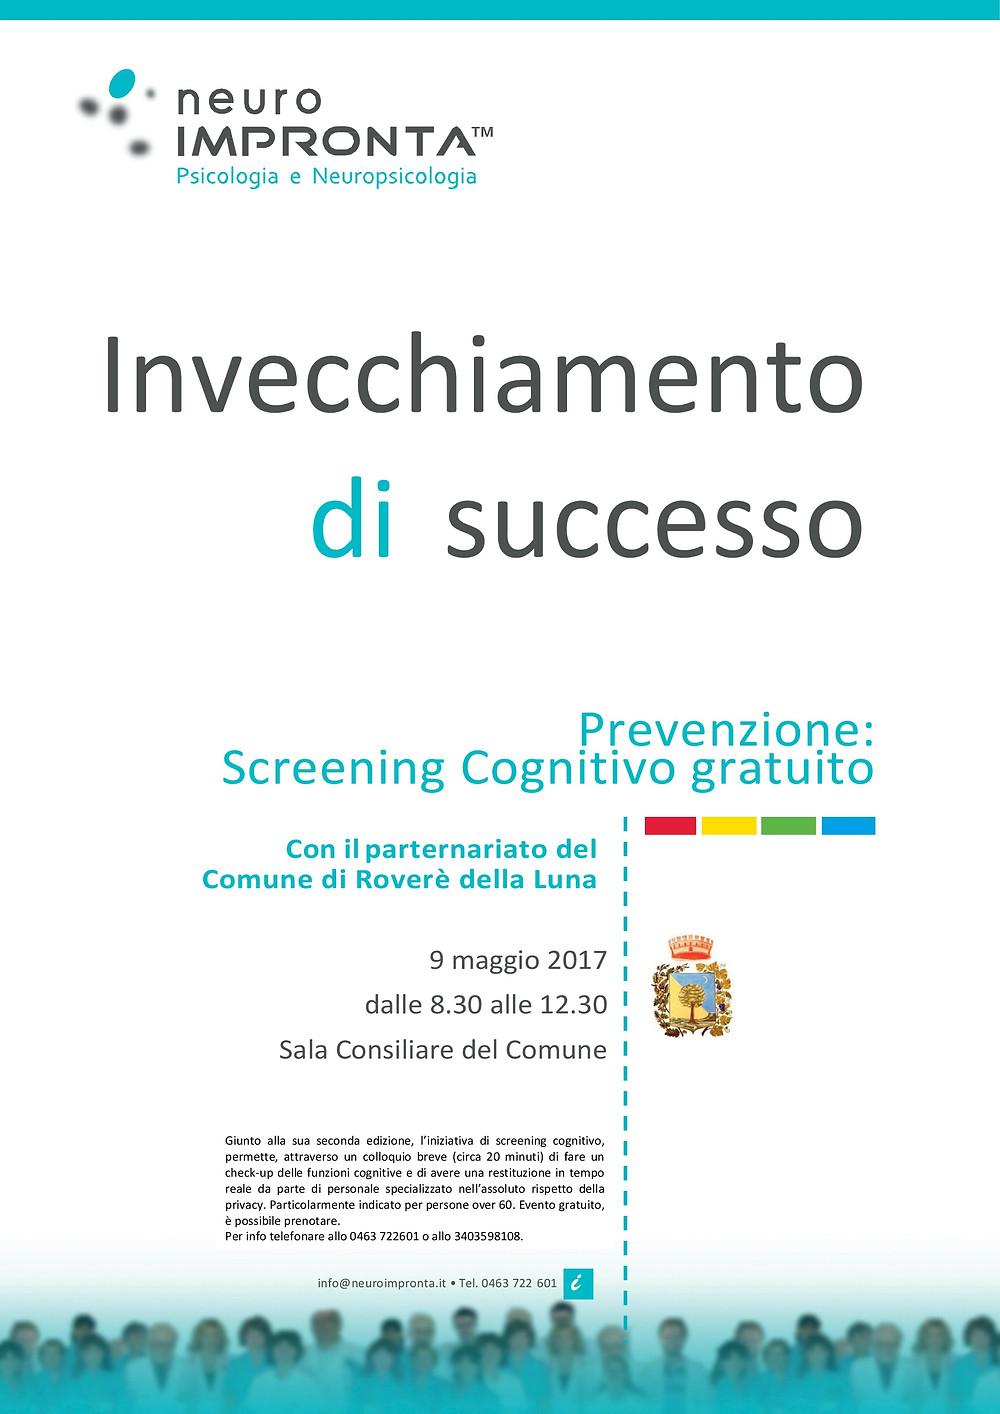 Screening cognitivo neuroimpronta